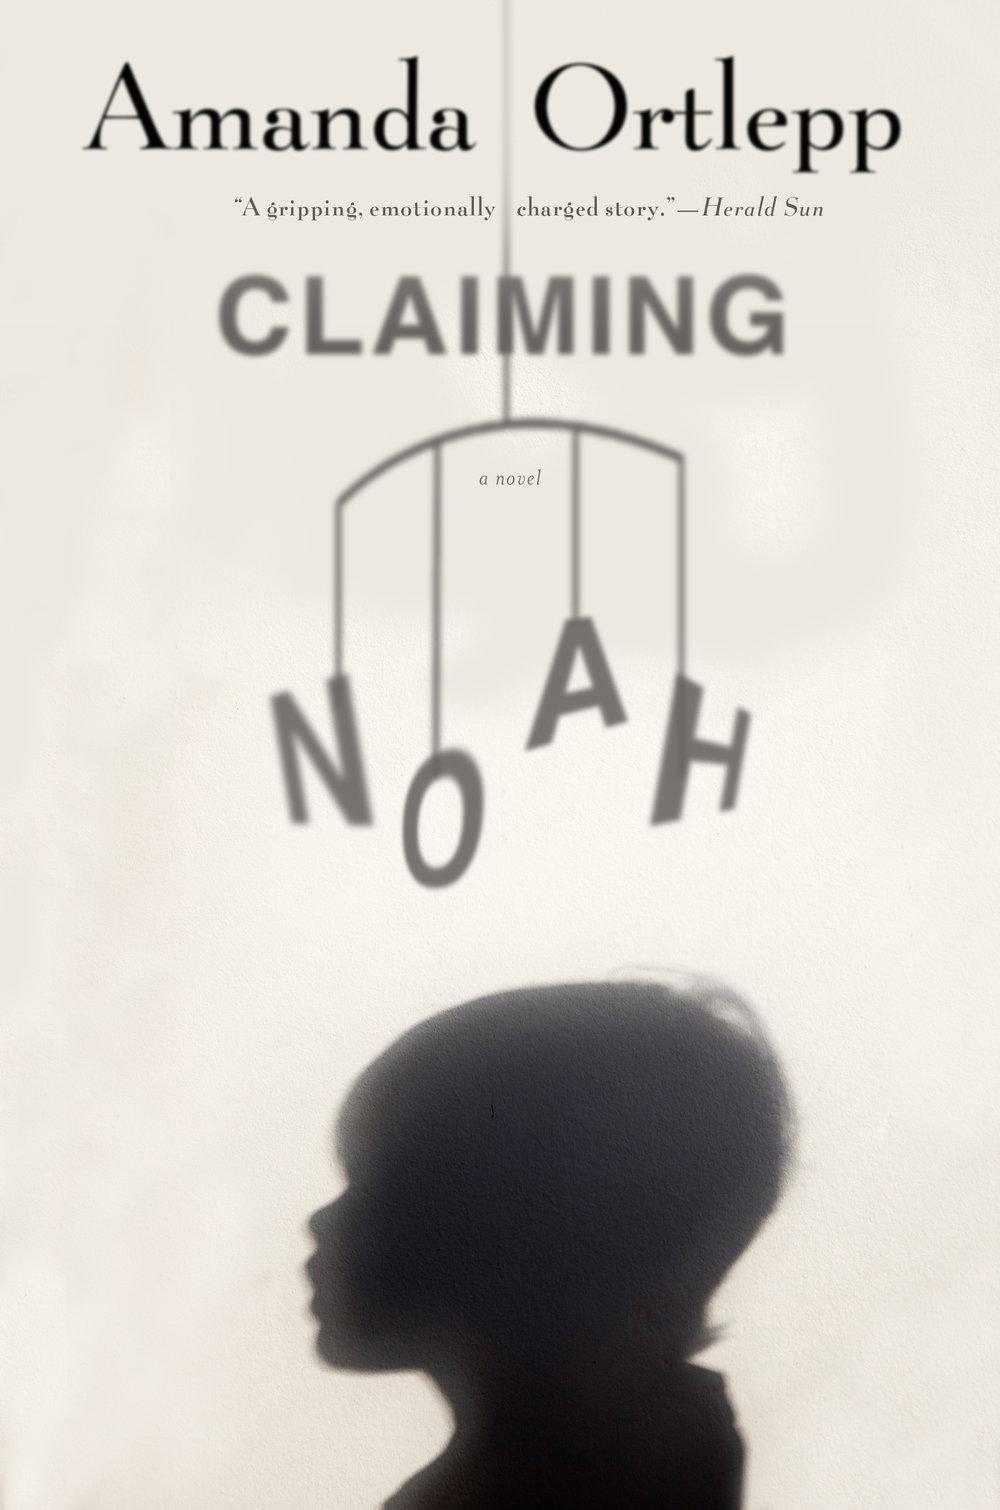 Claiming Noah_shadow_MOBILE_3bauthor top.jpg